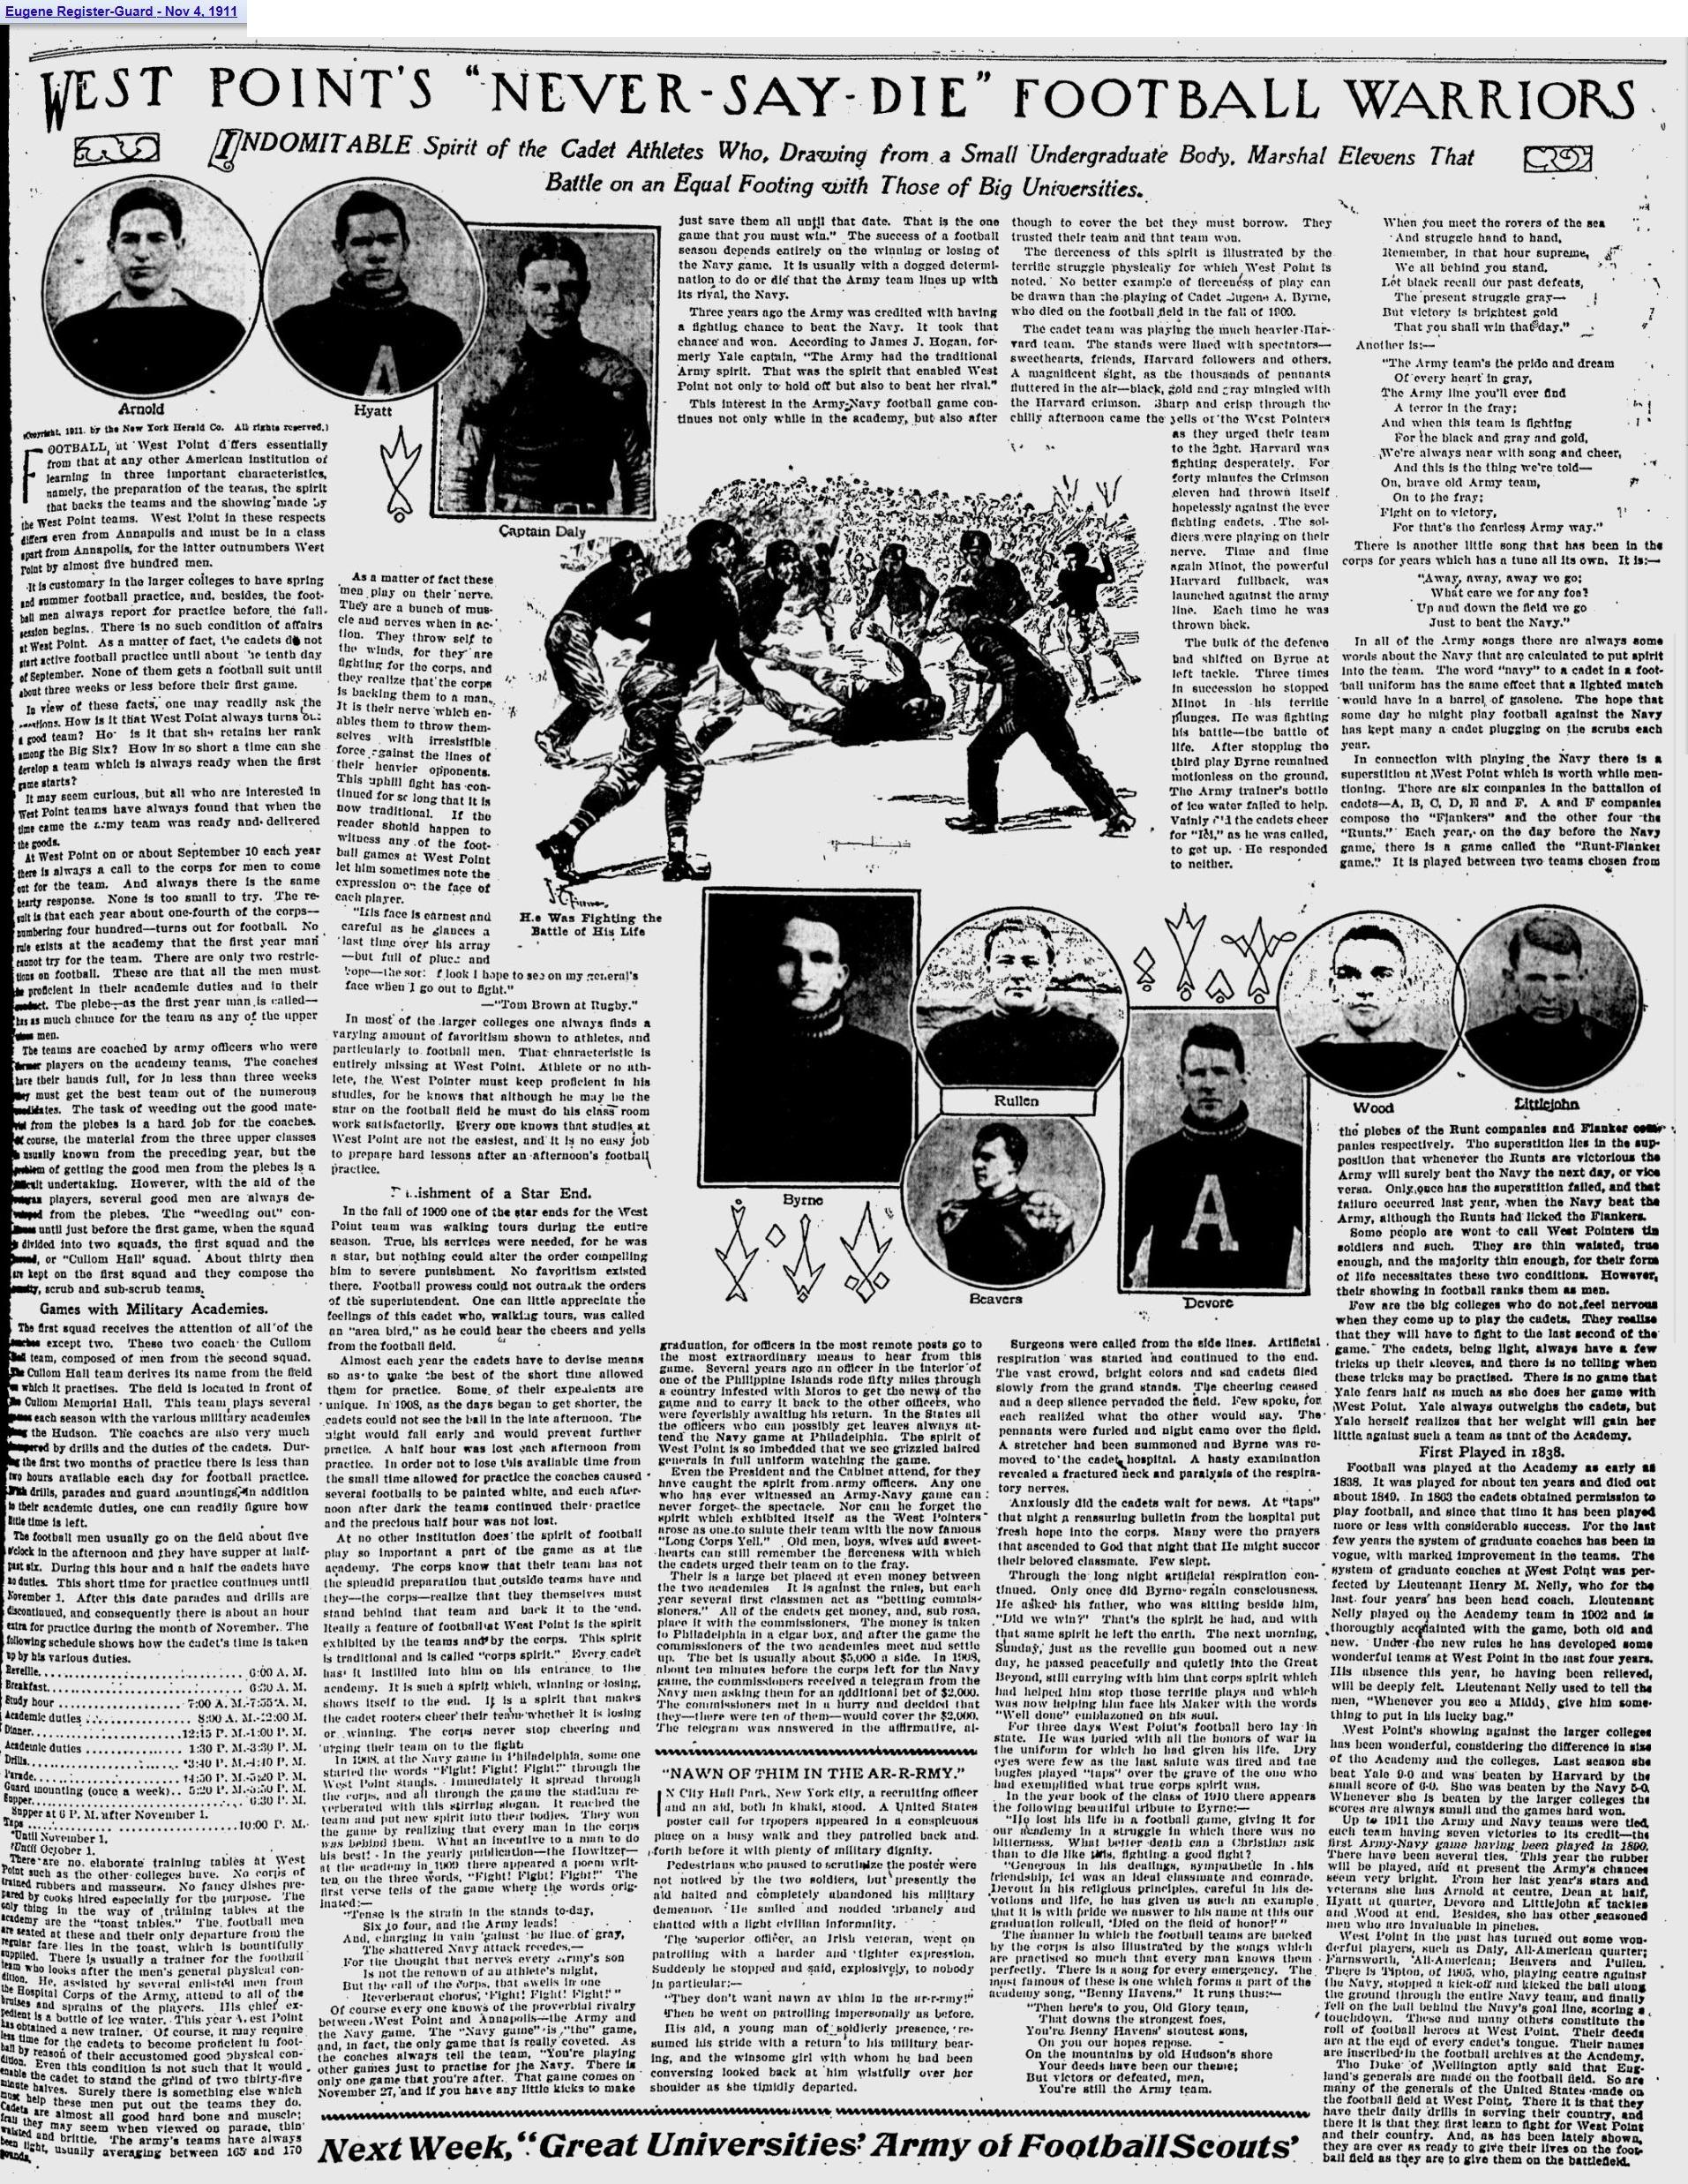 ArmyFB_1911_NeverSayDie_EugeneRegisterGuard_Nov41911